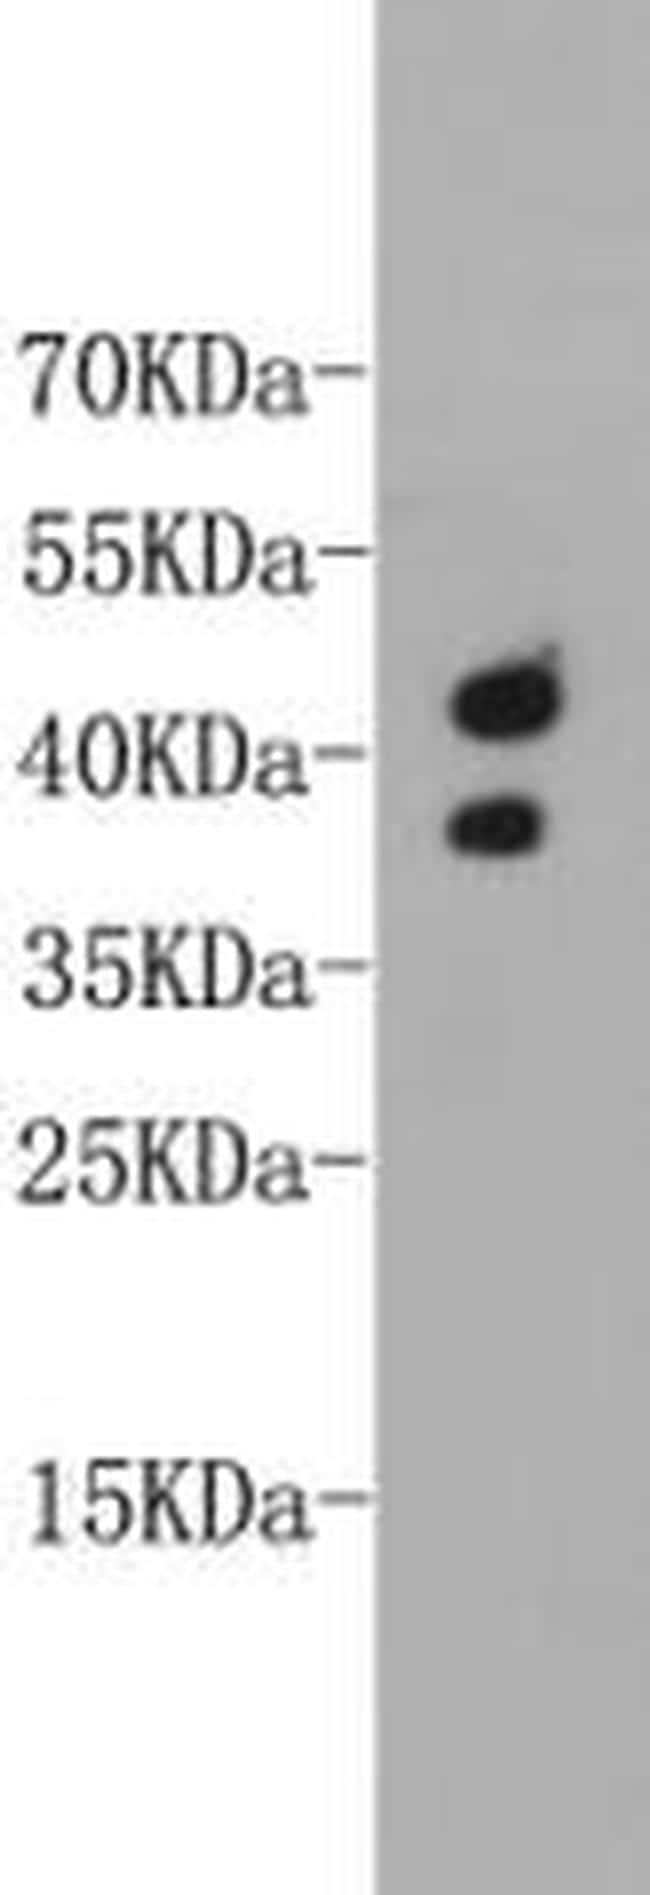 CD24 Antibody in Western Blot (WB)